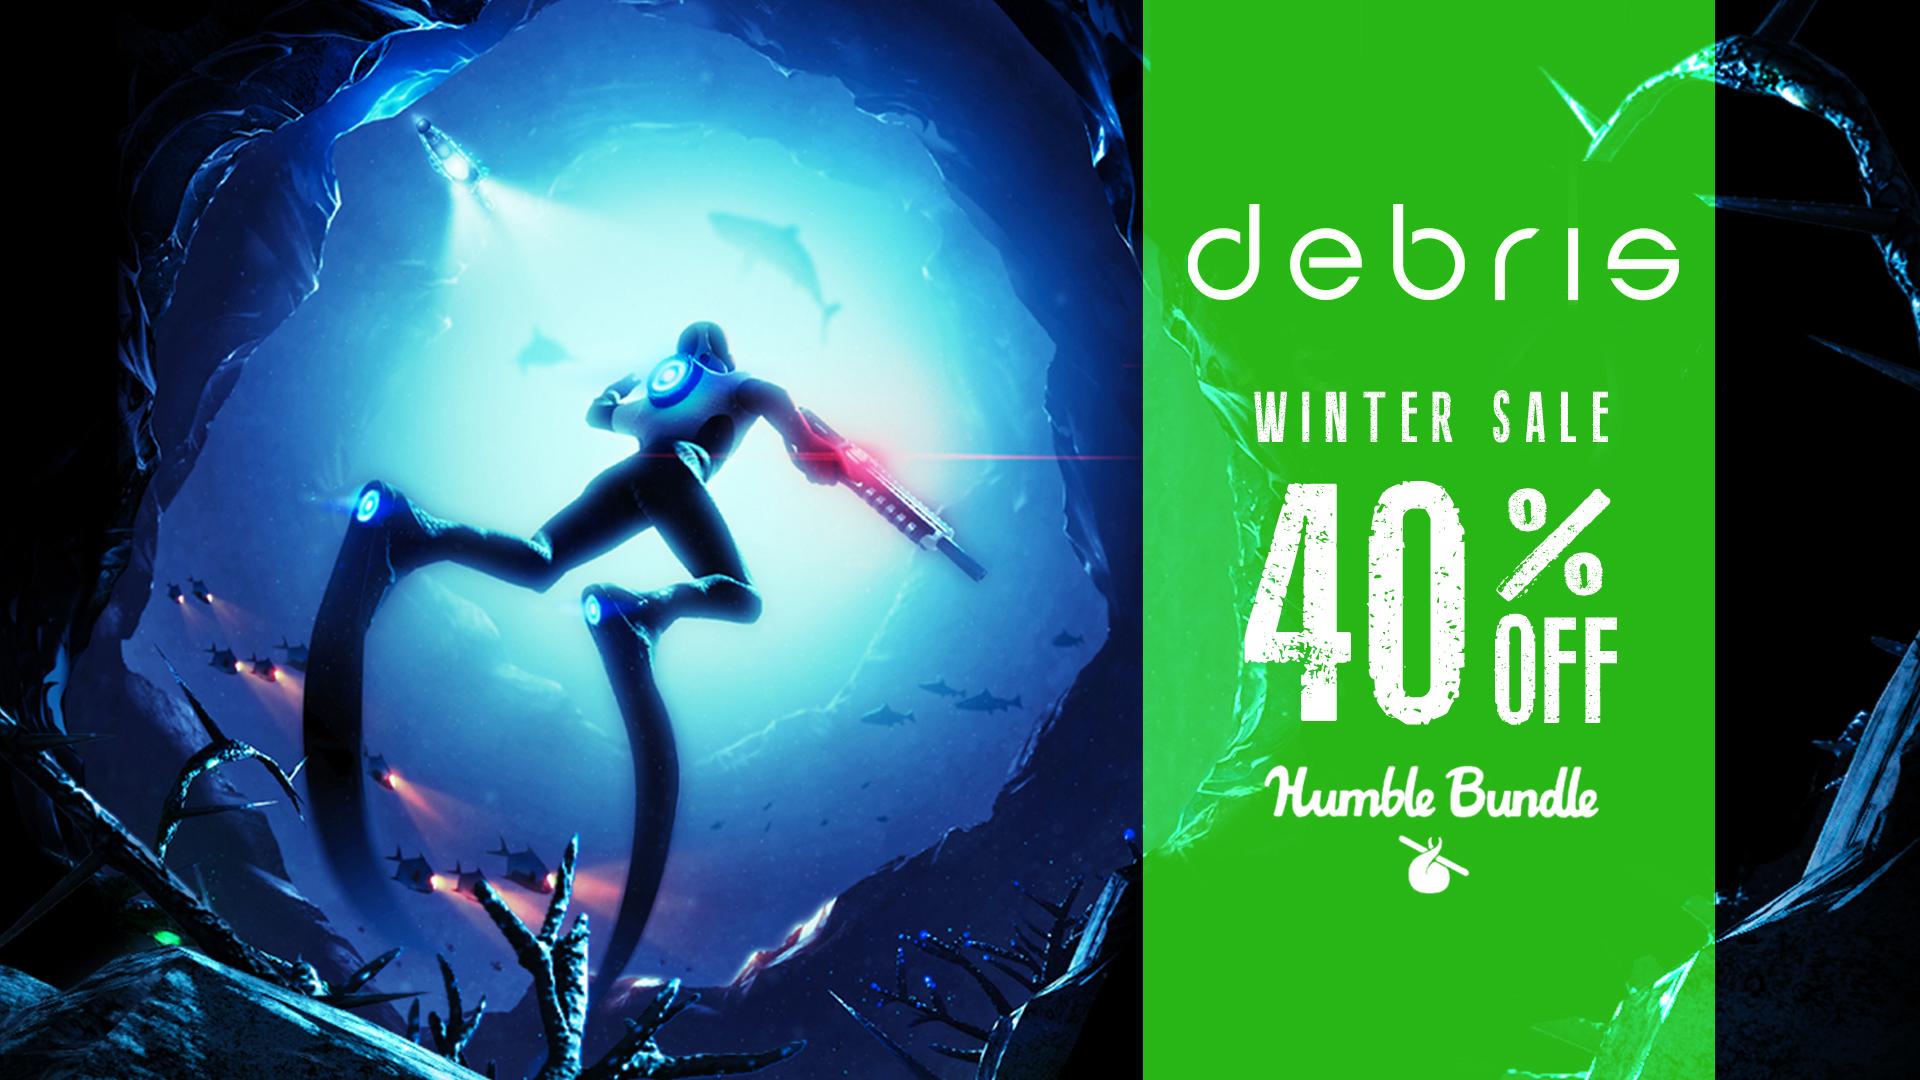 Debris Winter Sale Humble